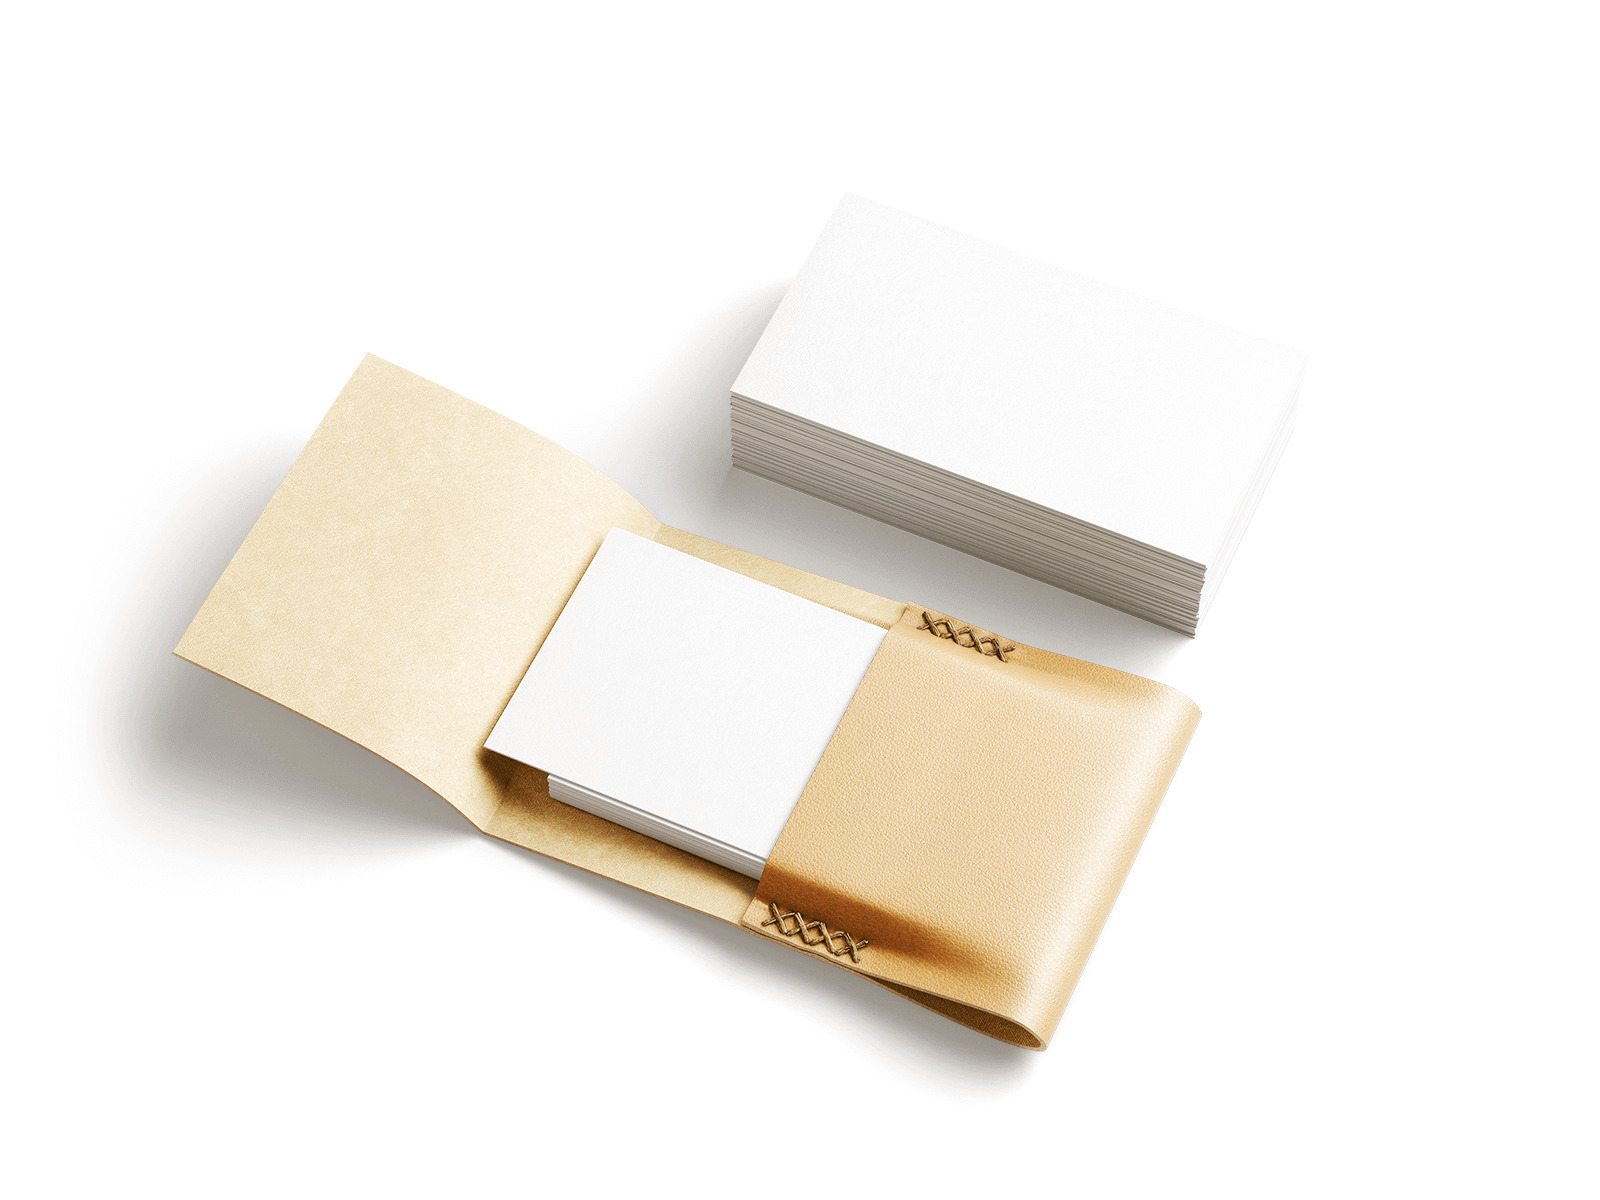 Free Leather Business Card Holder Mockup